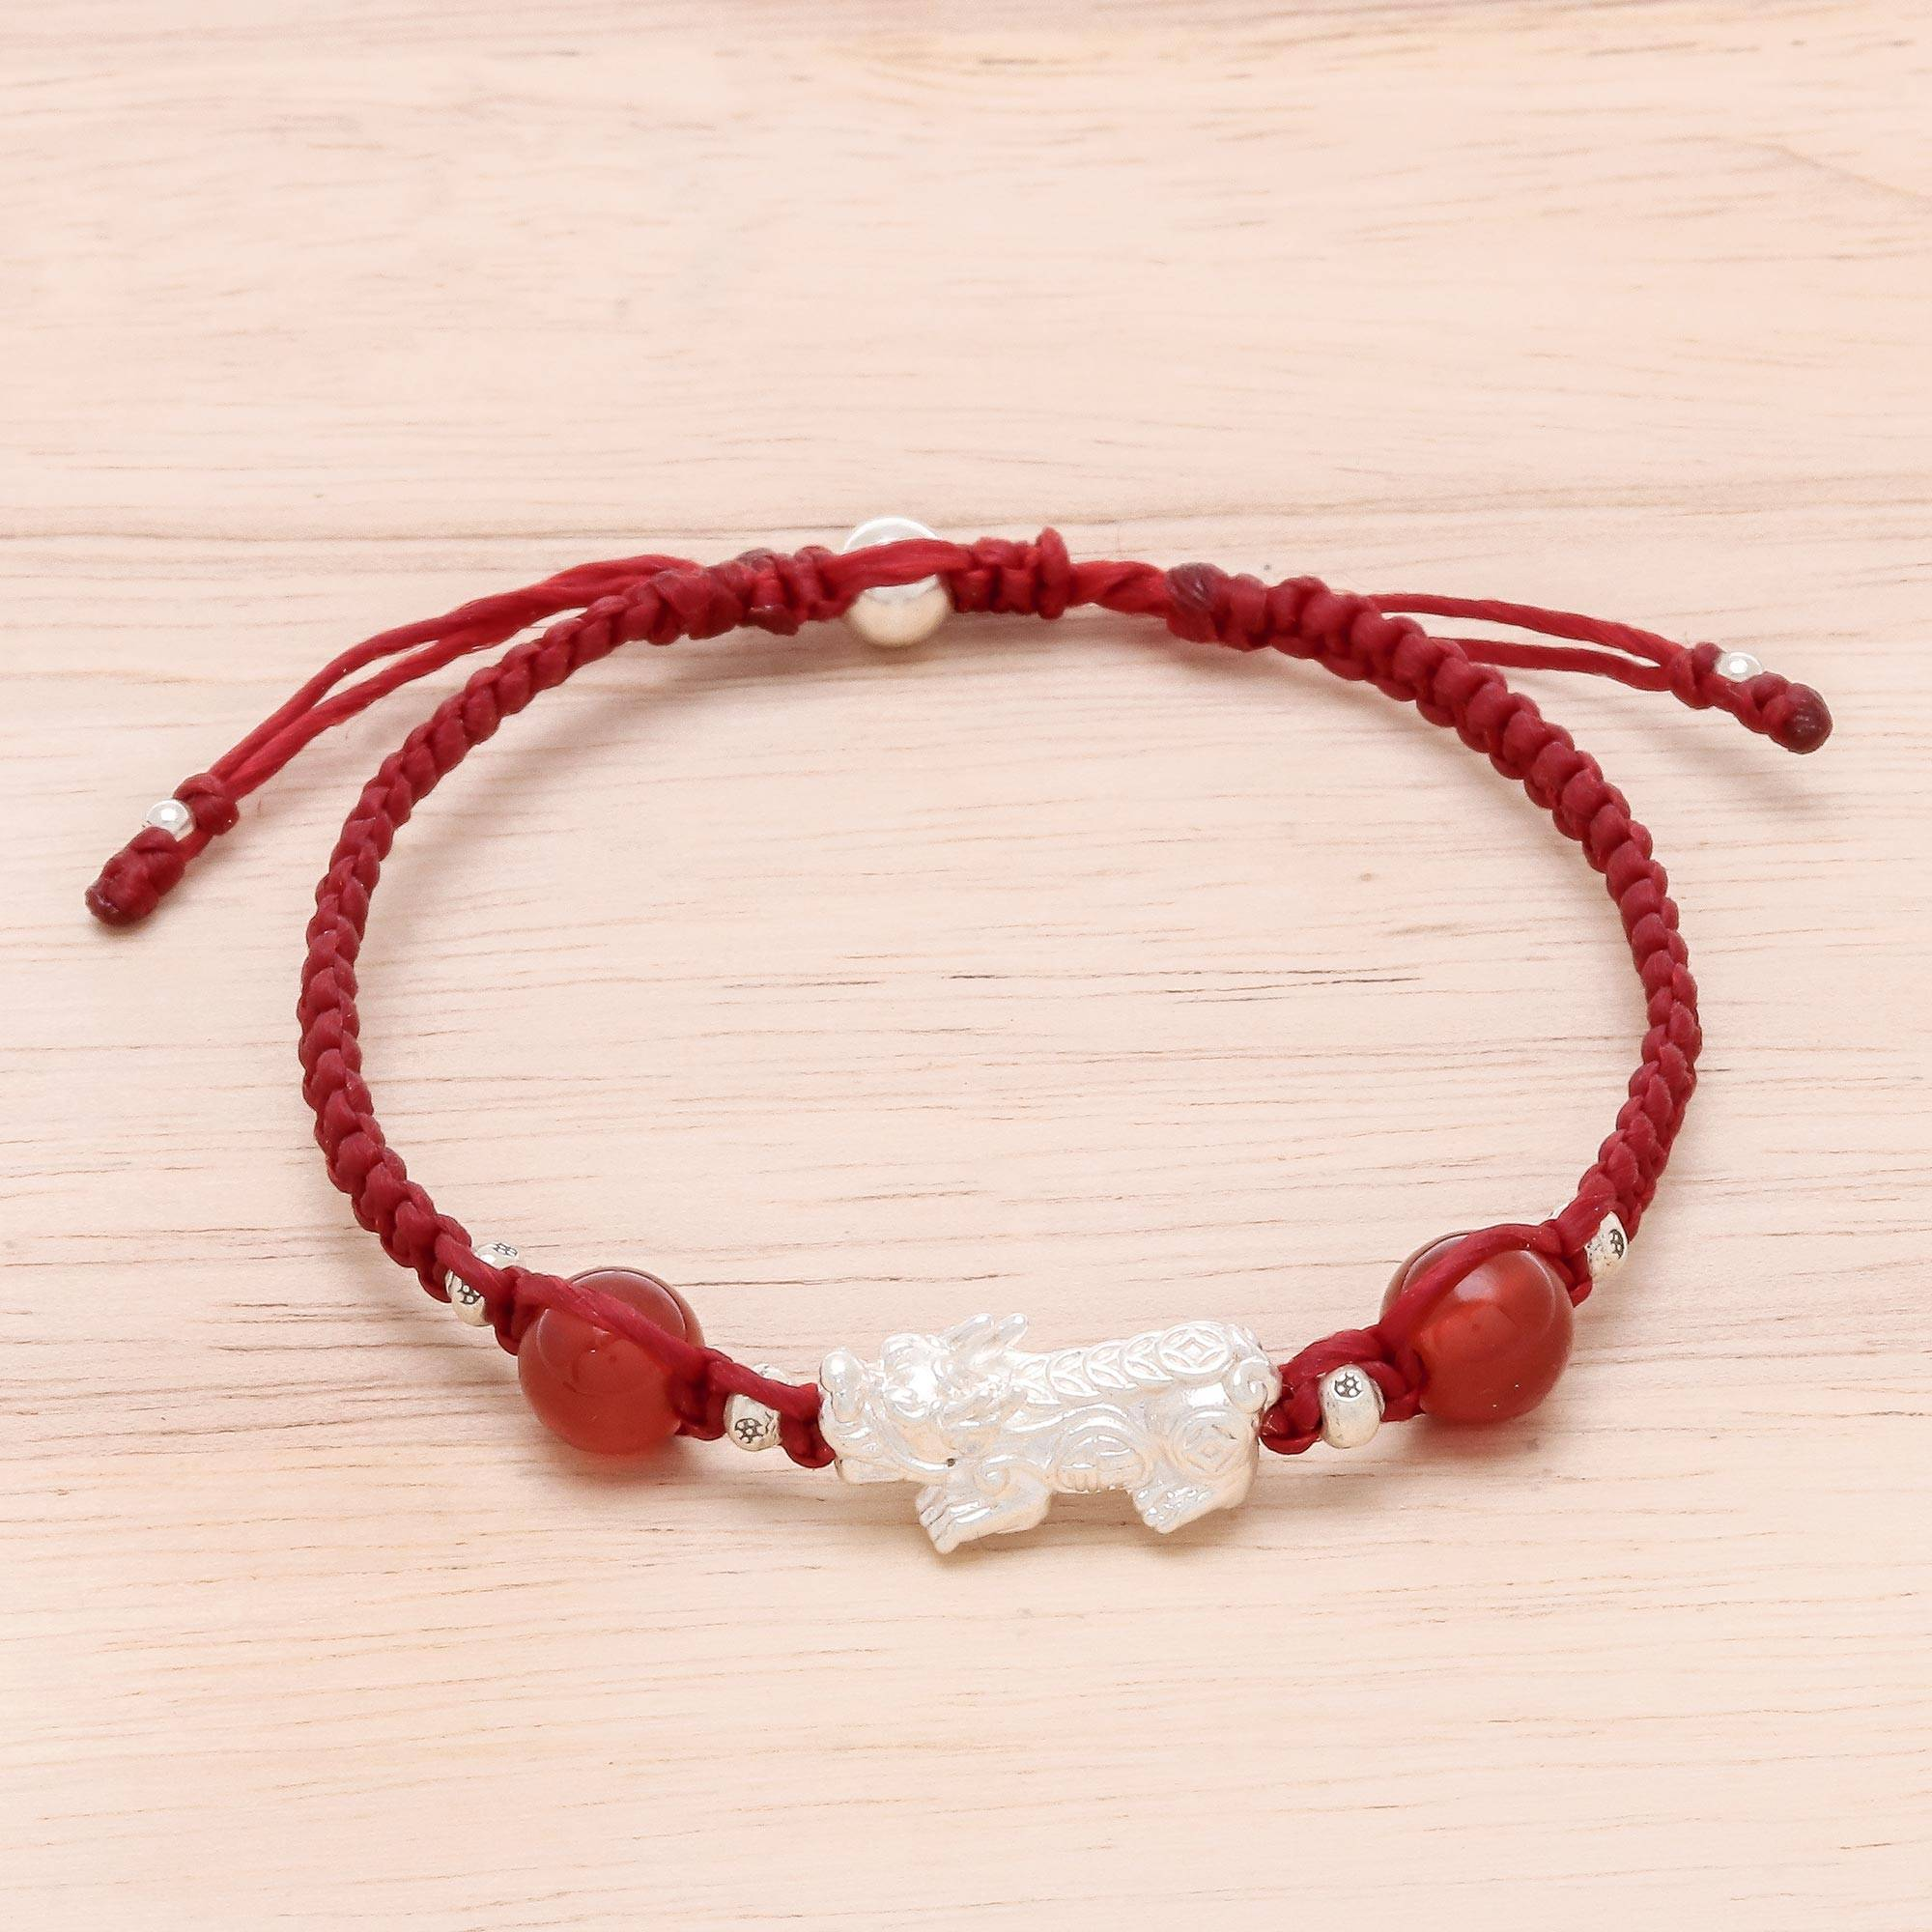 Carnelian Macrame Pendant Bracelet